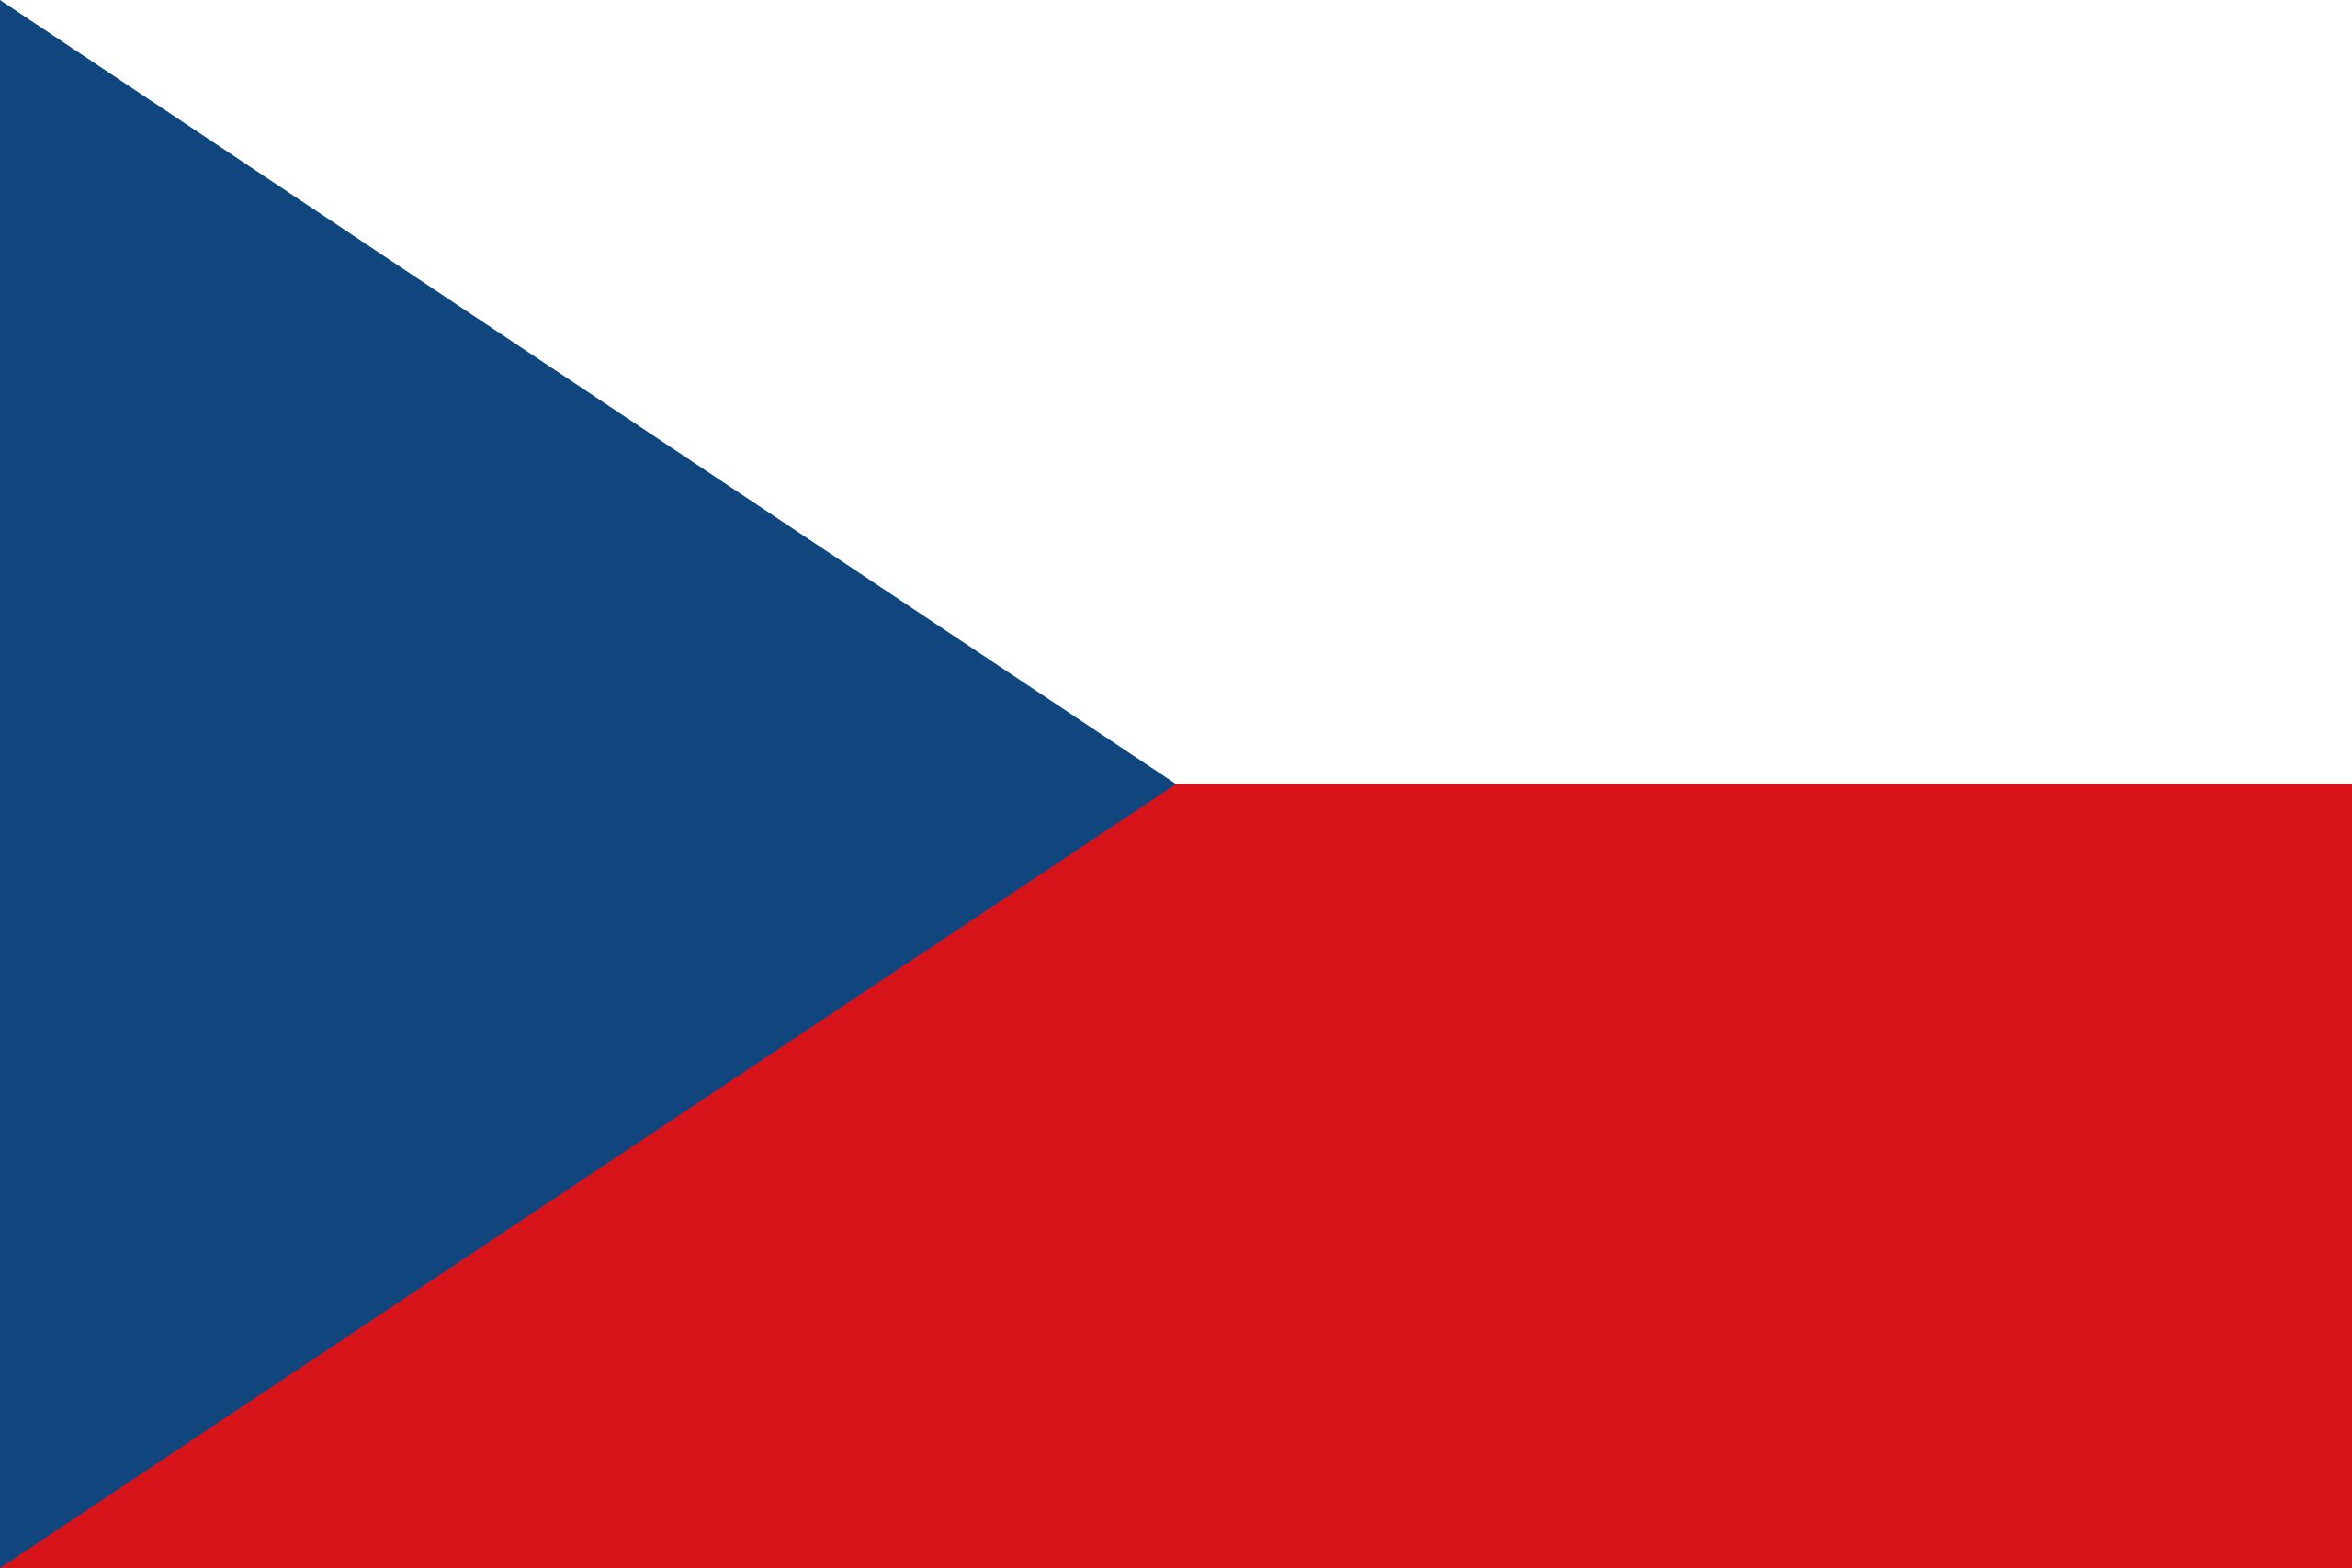 república checa, χώρα, έμβλημα, λογότυπο, σύμβολο - Wallpapers HD - Professor-falken.com